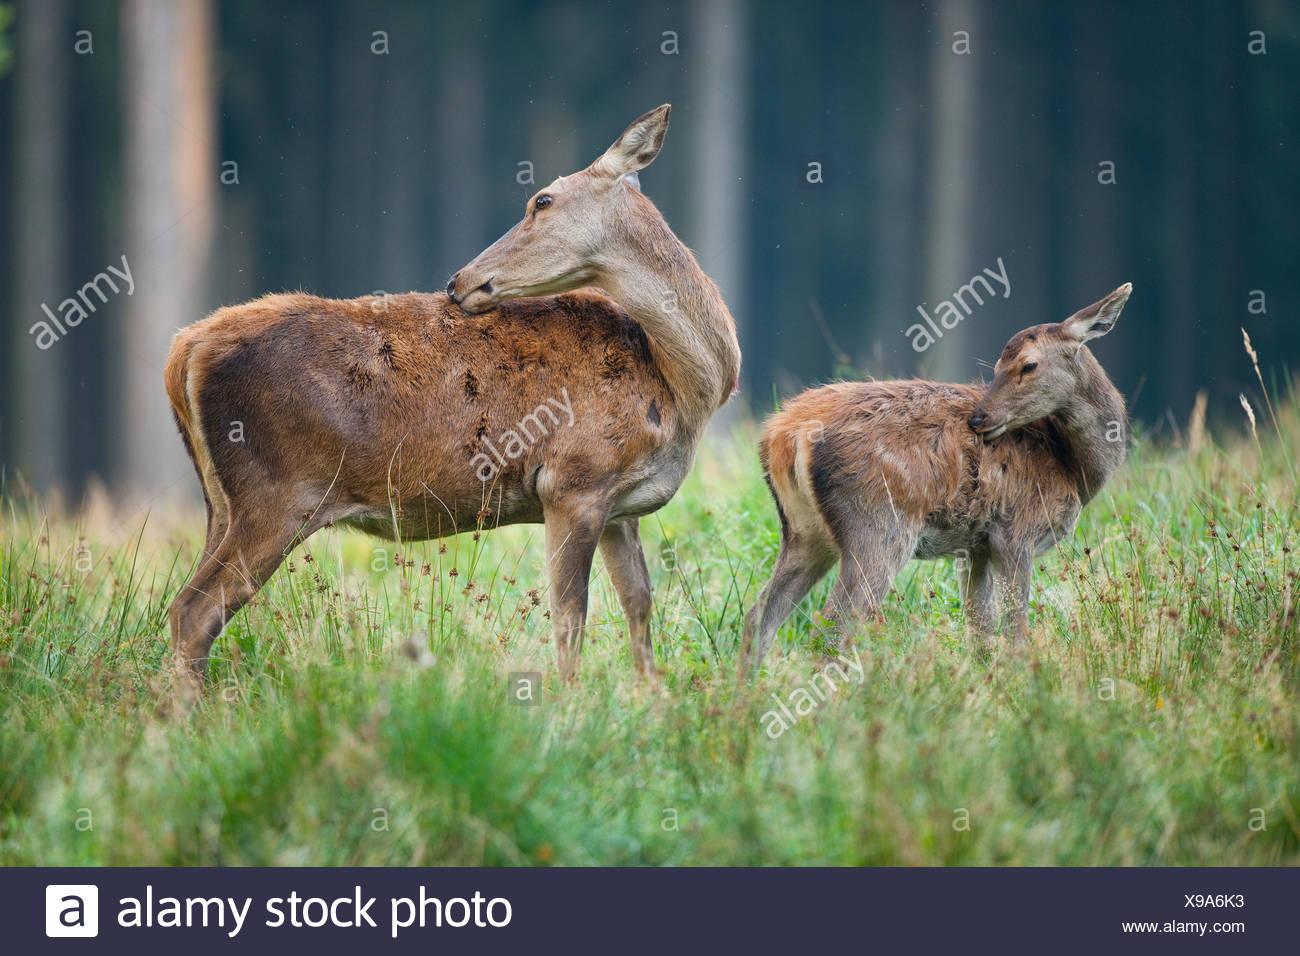 Red deer (Cervus elaphus), fawn and doe, captive, Saxony, Germany - Stock Image